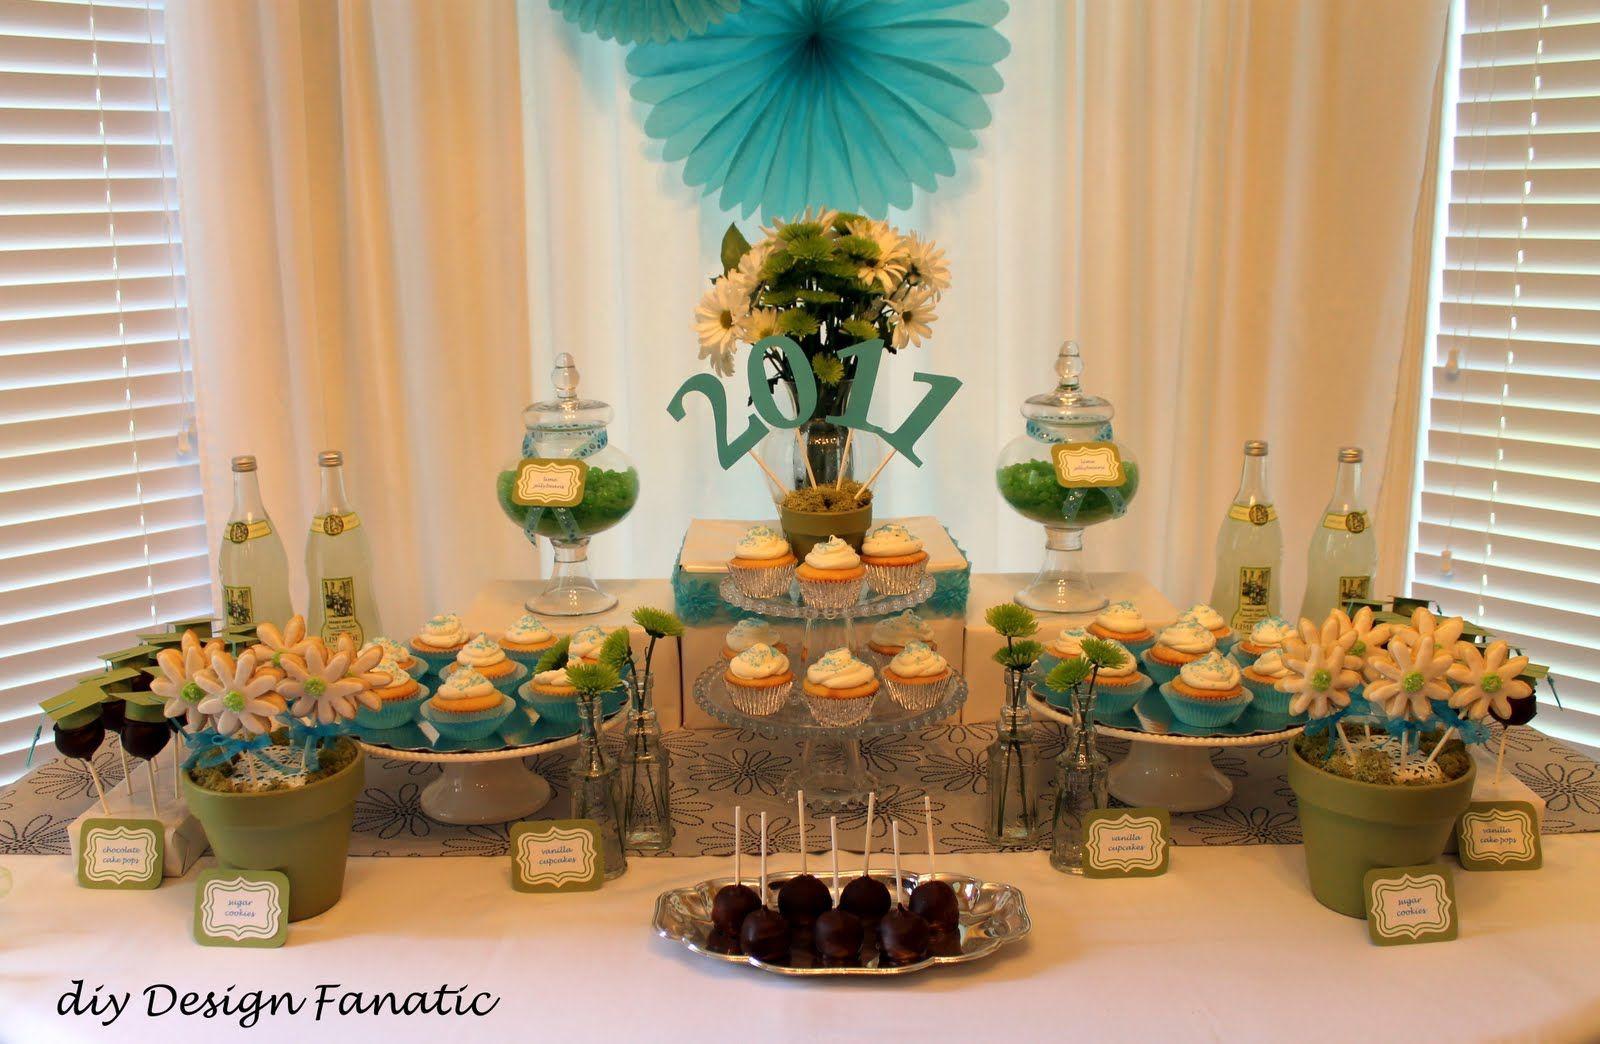 Dessert Table Ideas For Graduation Party  graduation dessert table